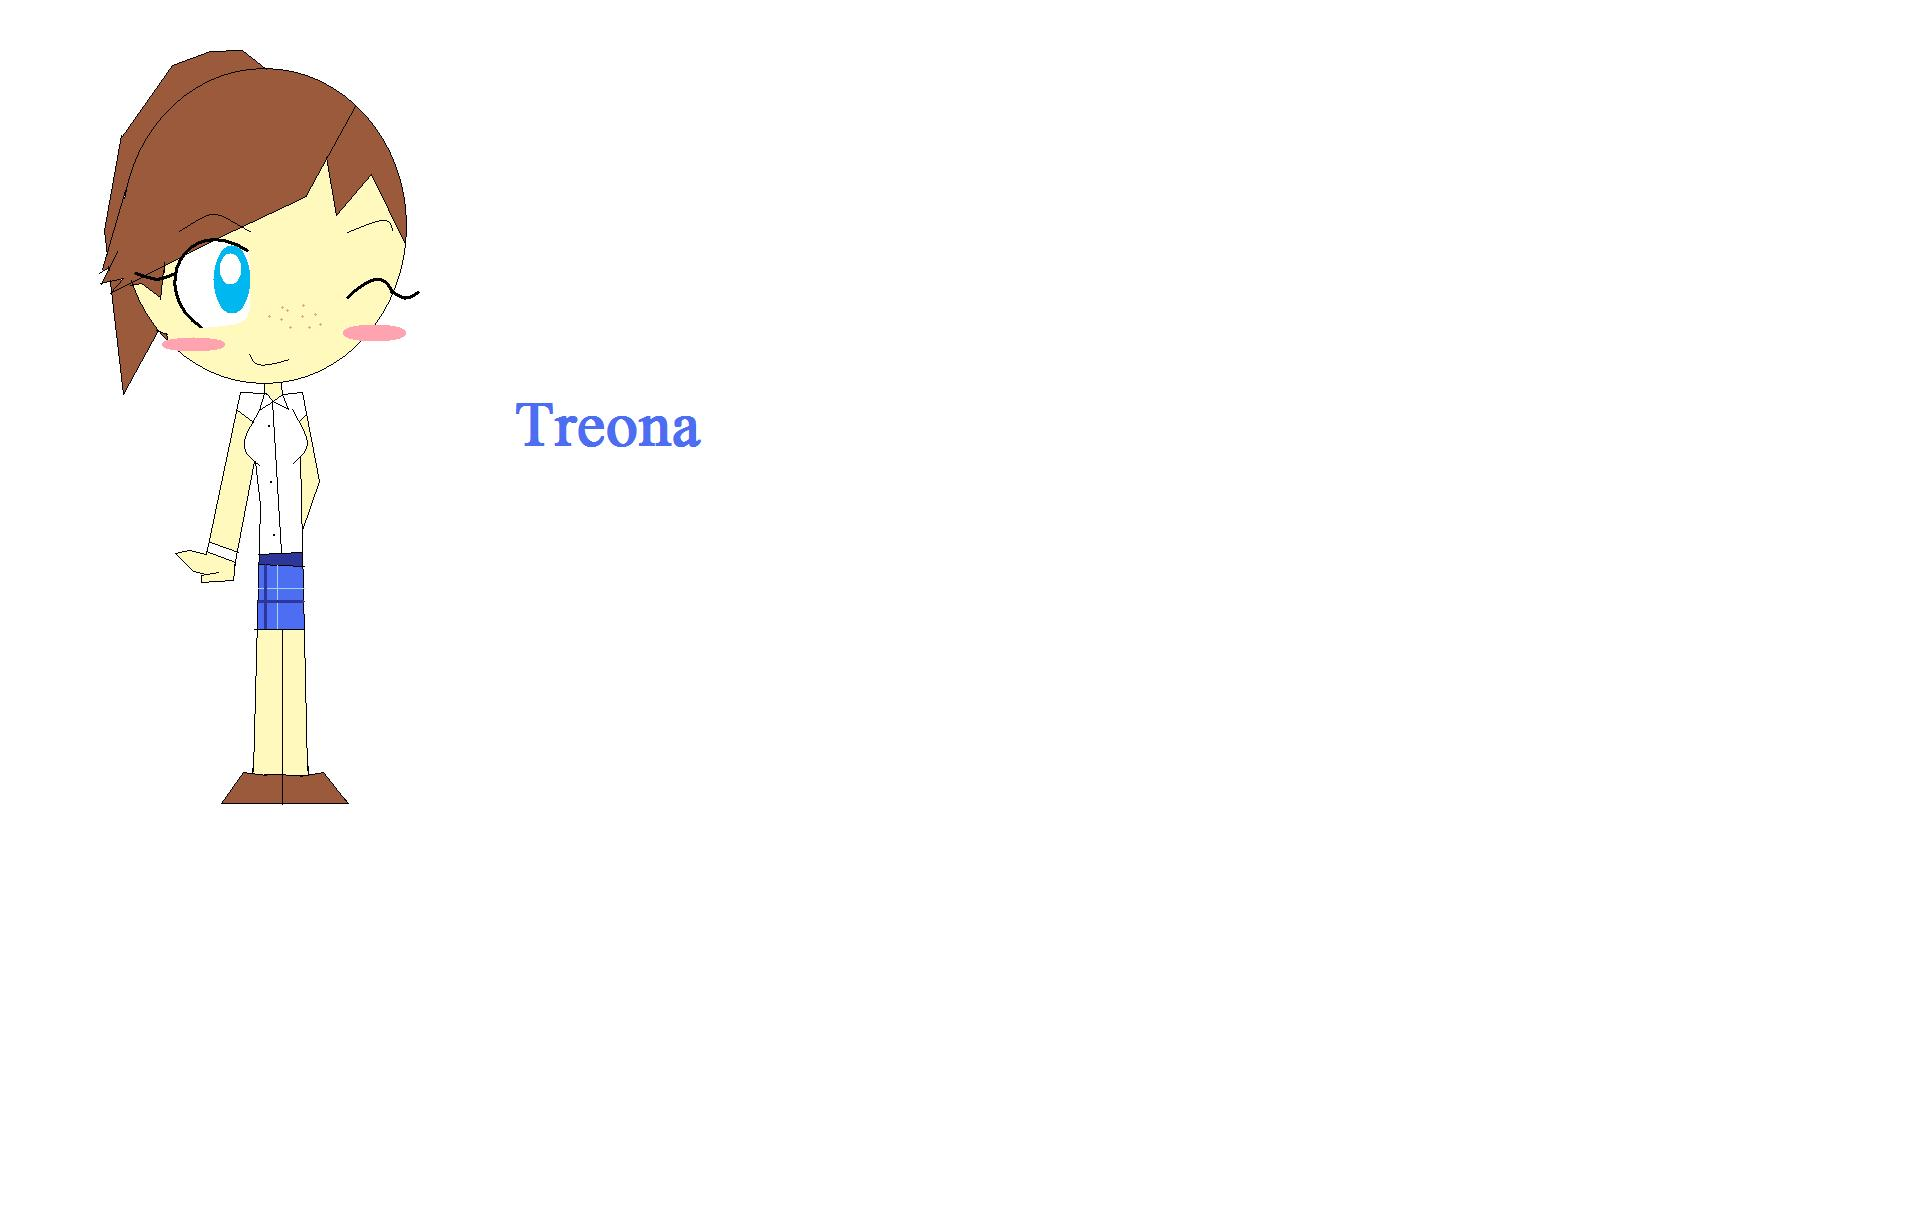 Treona, My Sims